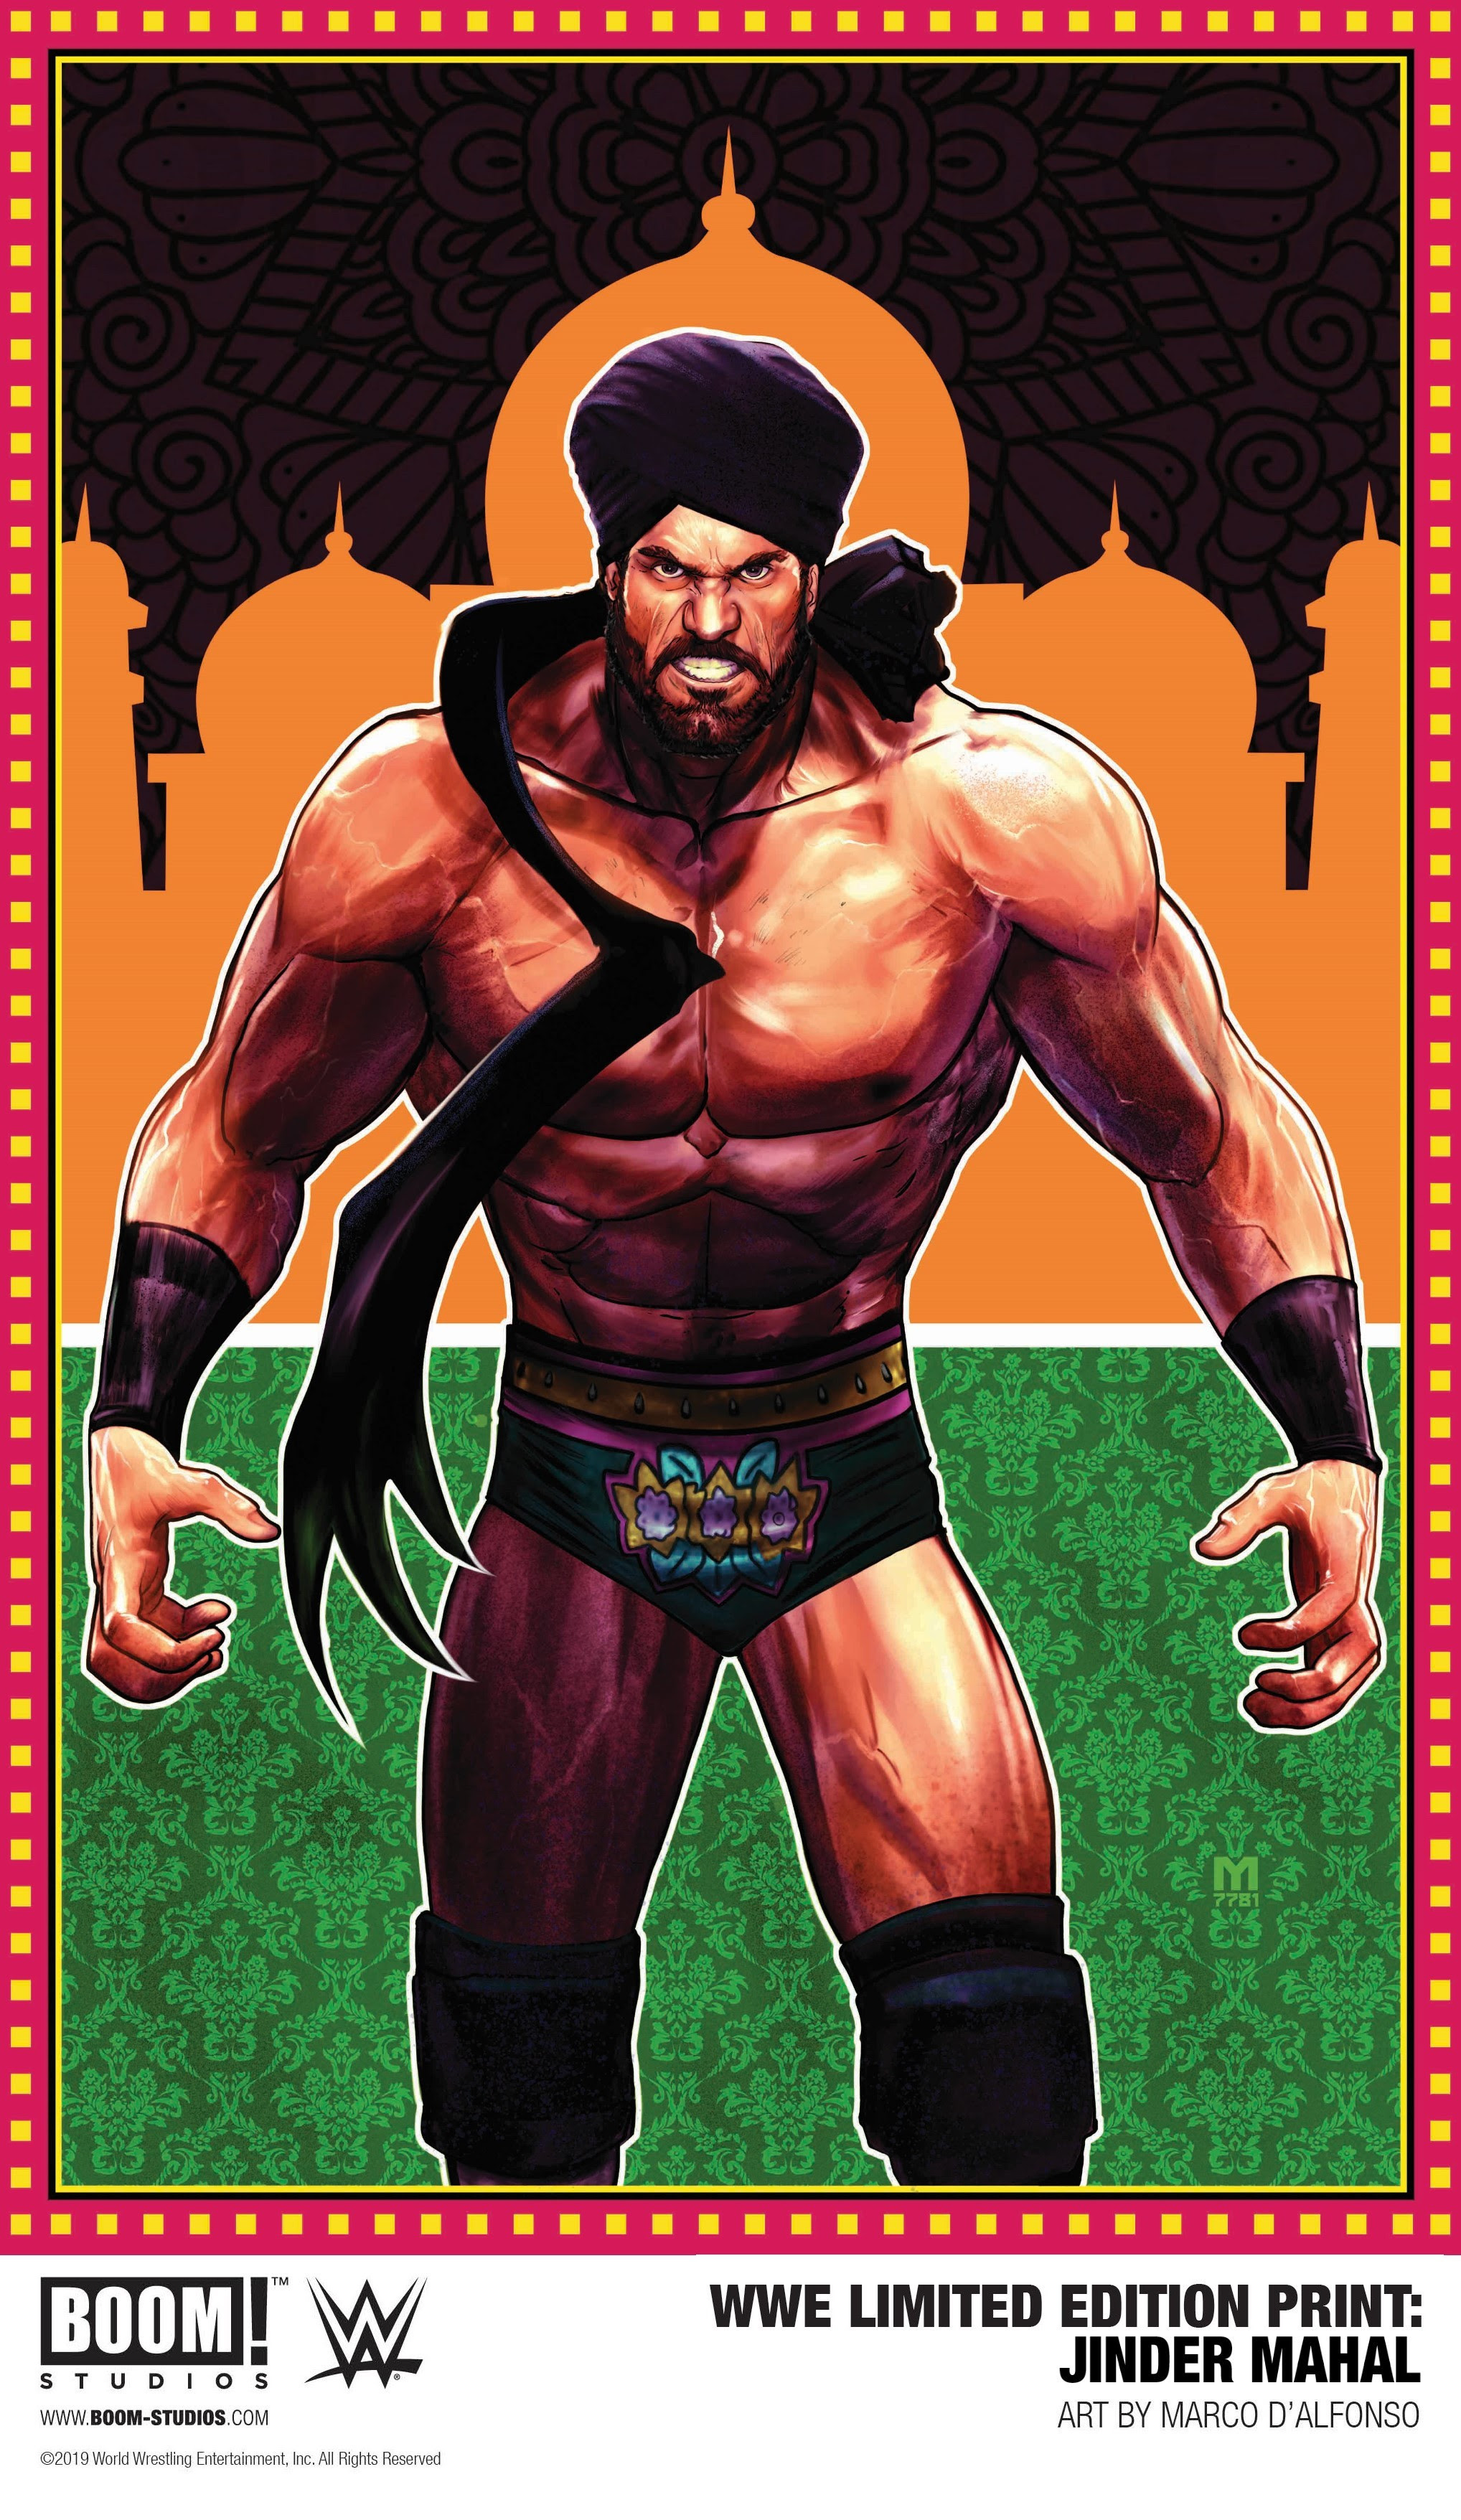 WWE Limited Edition Print: Jinder Mahal